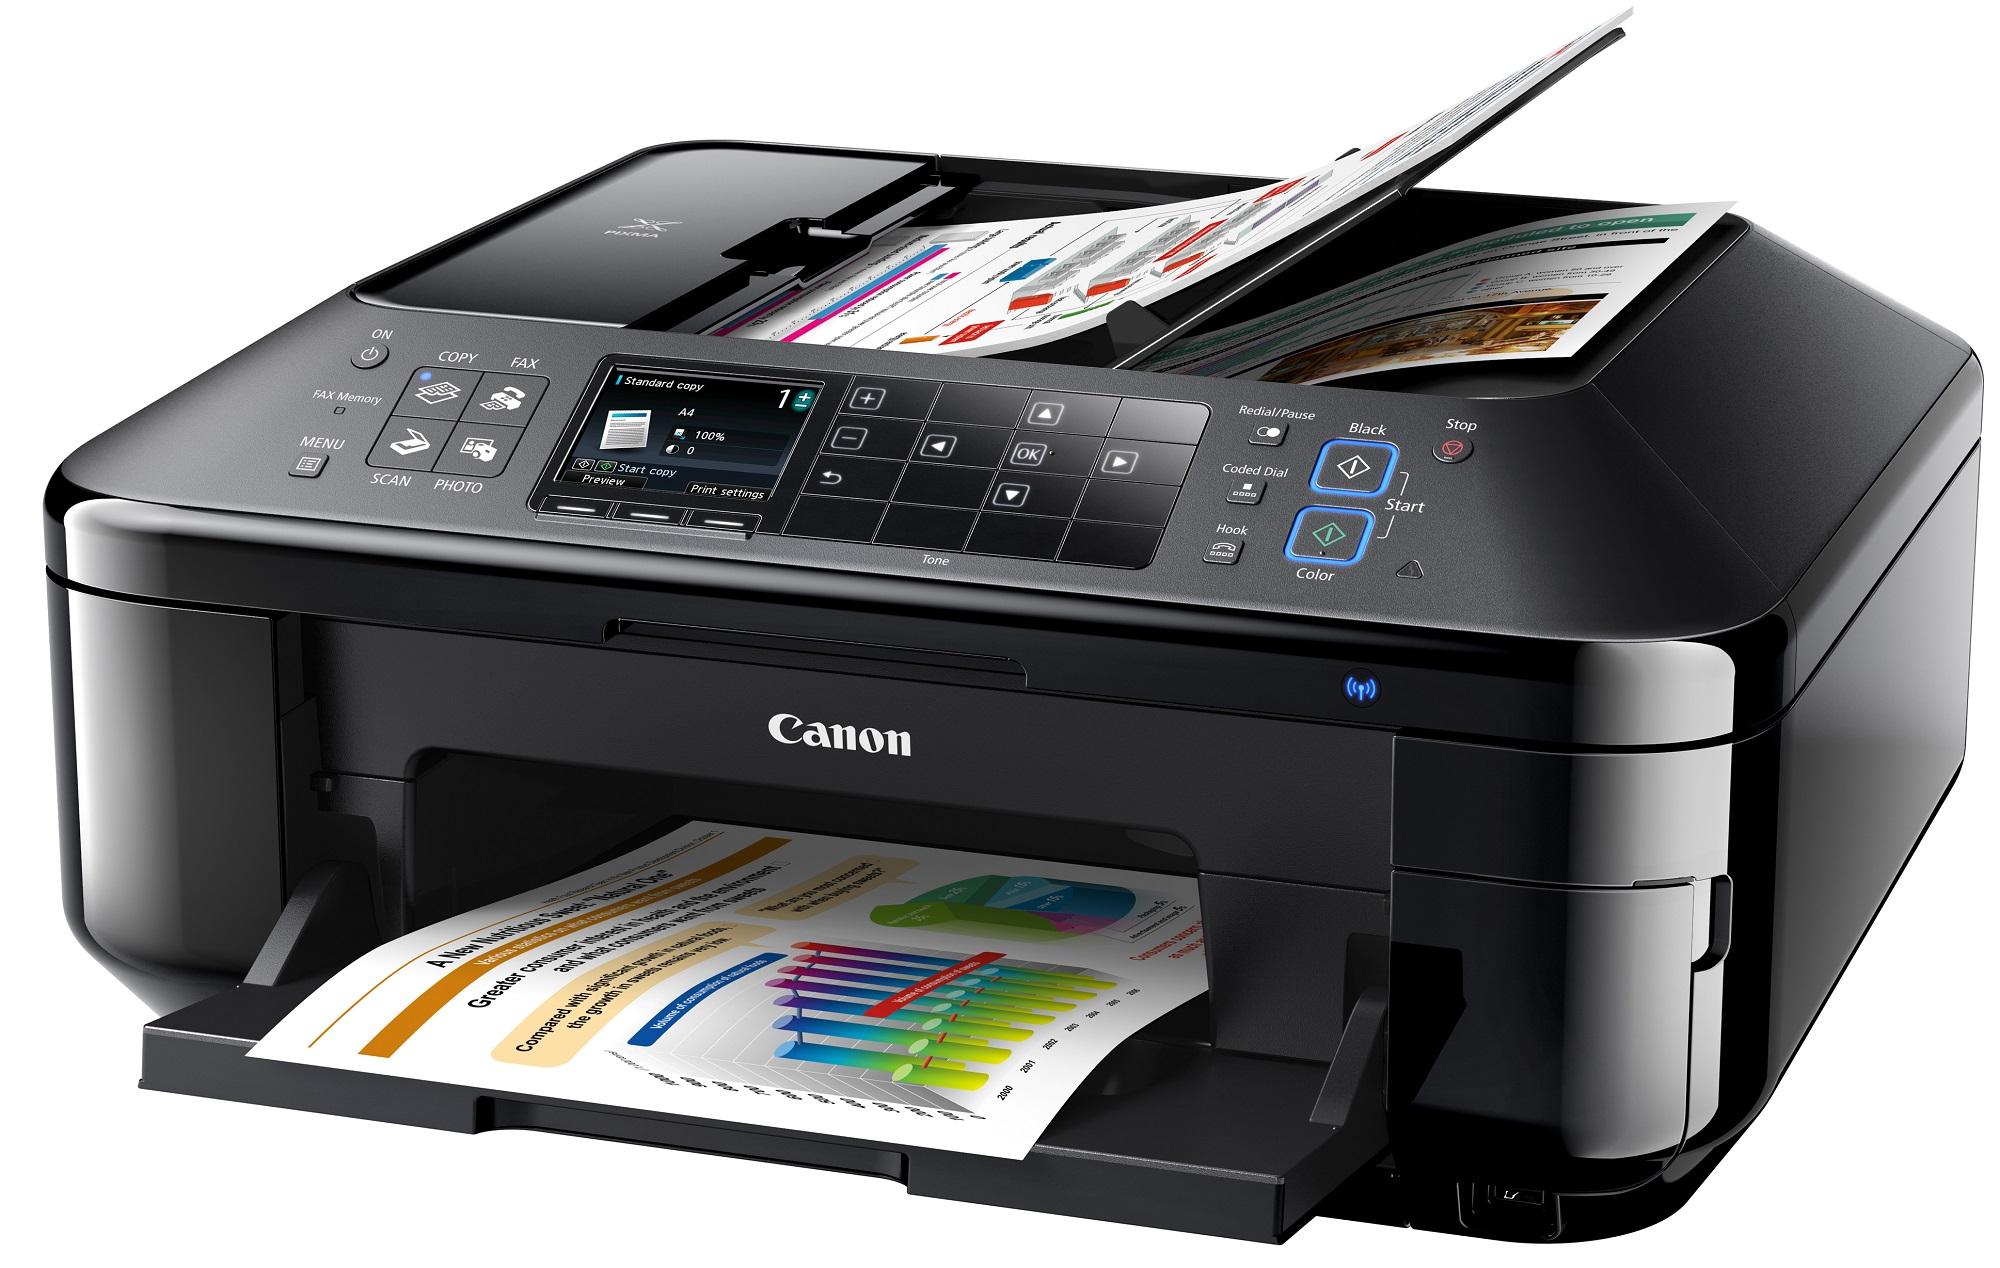 Stupendous Pixma Canon Class Action Analysed Recycler Canon Inkjet Printer Settlement Claim Form dpreview Canon Inkjet Printer Settlement